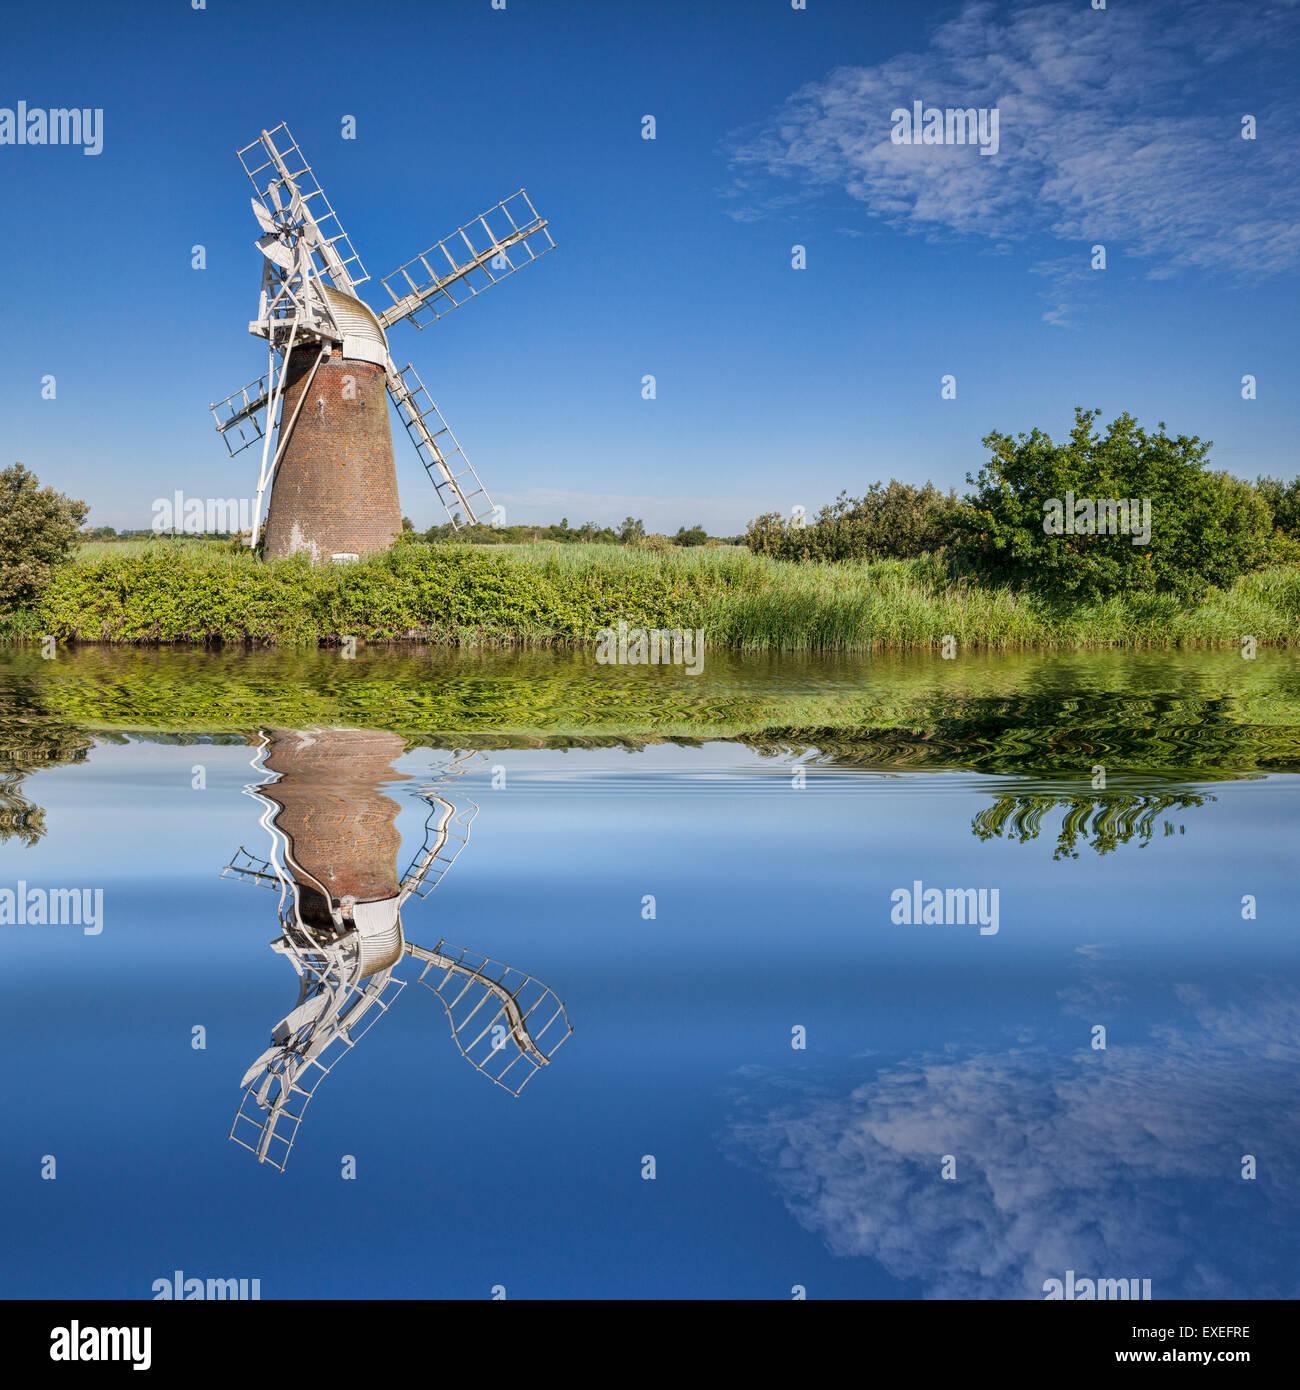 Turf Fen Winmill se reflétant dans les eaux lisses des Norfolk Broads, Norfolk, Angleterre Photo Stock